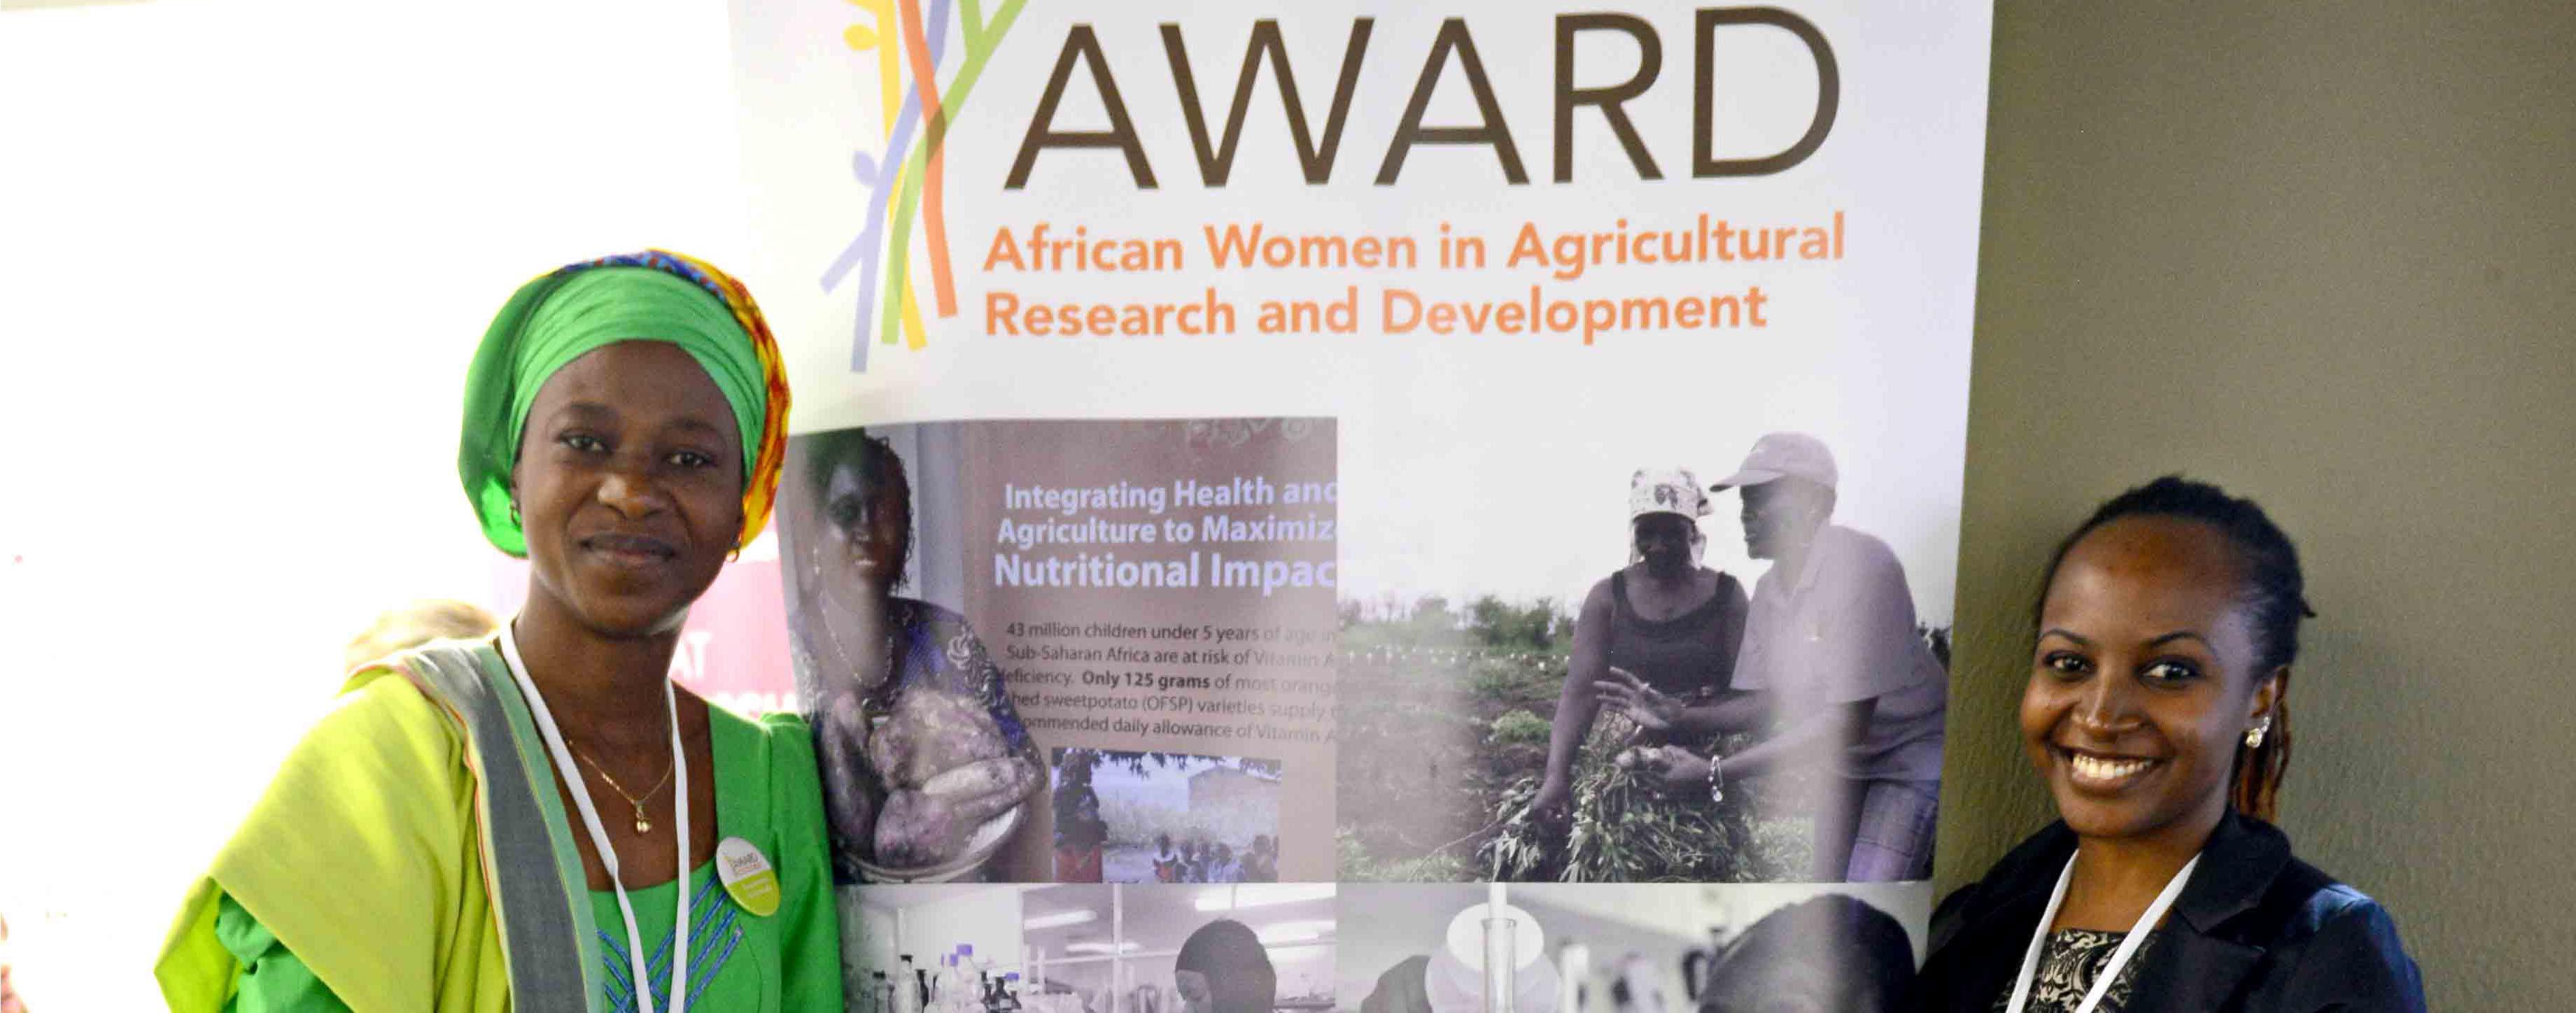 African Women in Agricultural Research & Development (AWARD) Fellowship 2017/18